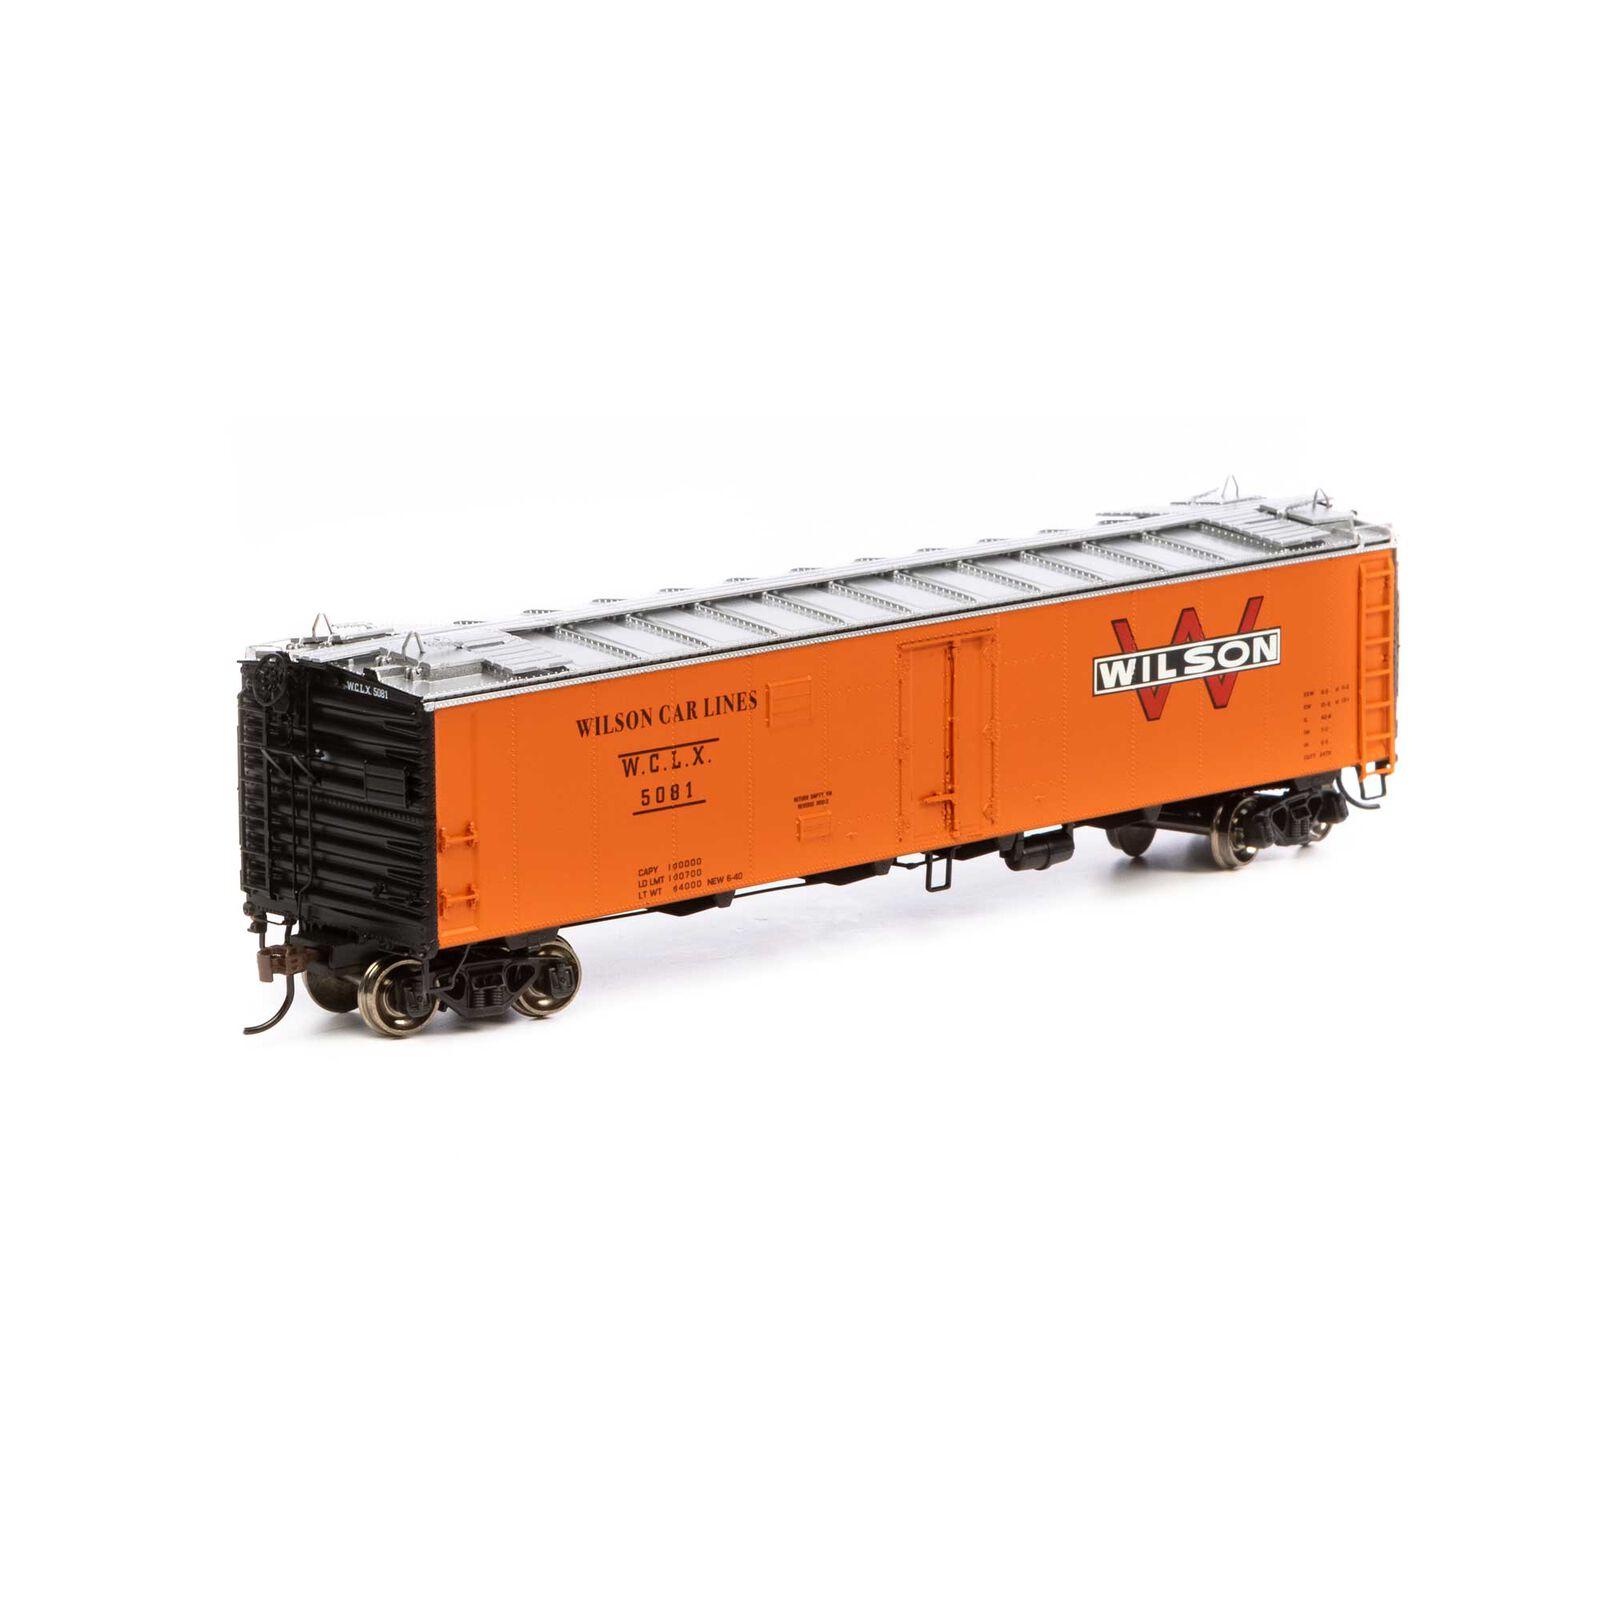 HO RTR 50' Ice Bunker Reefer WCLX #5081